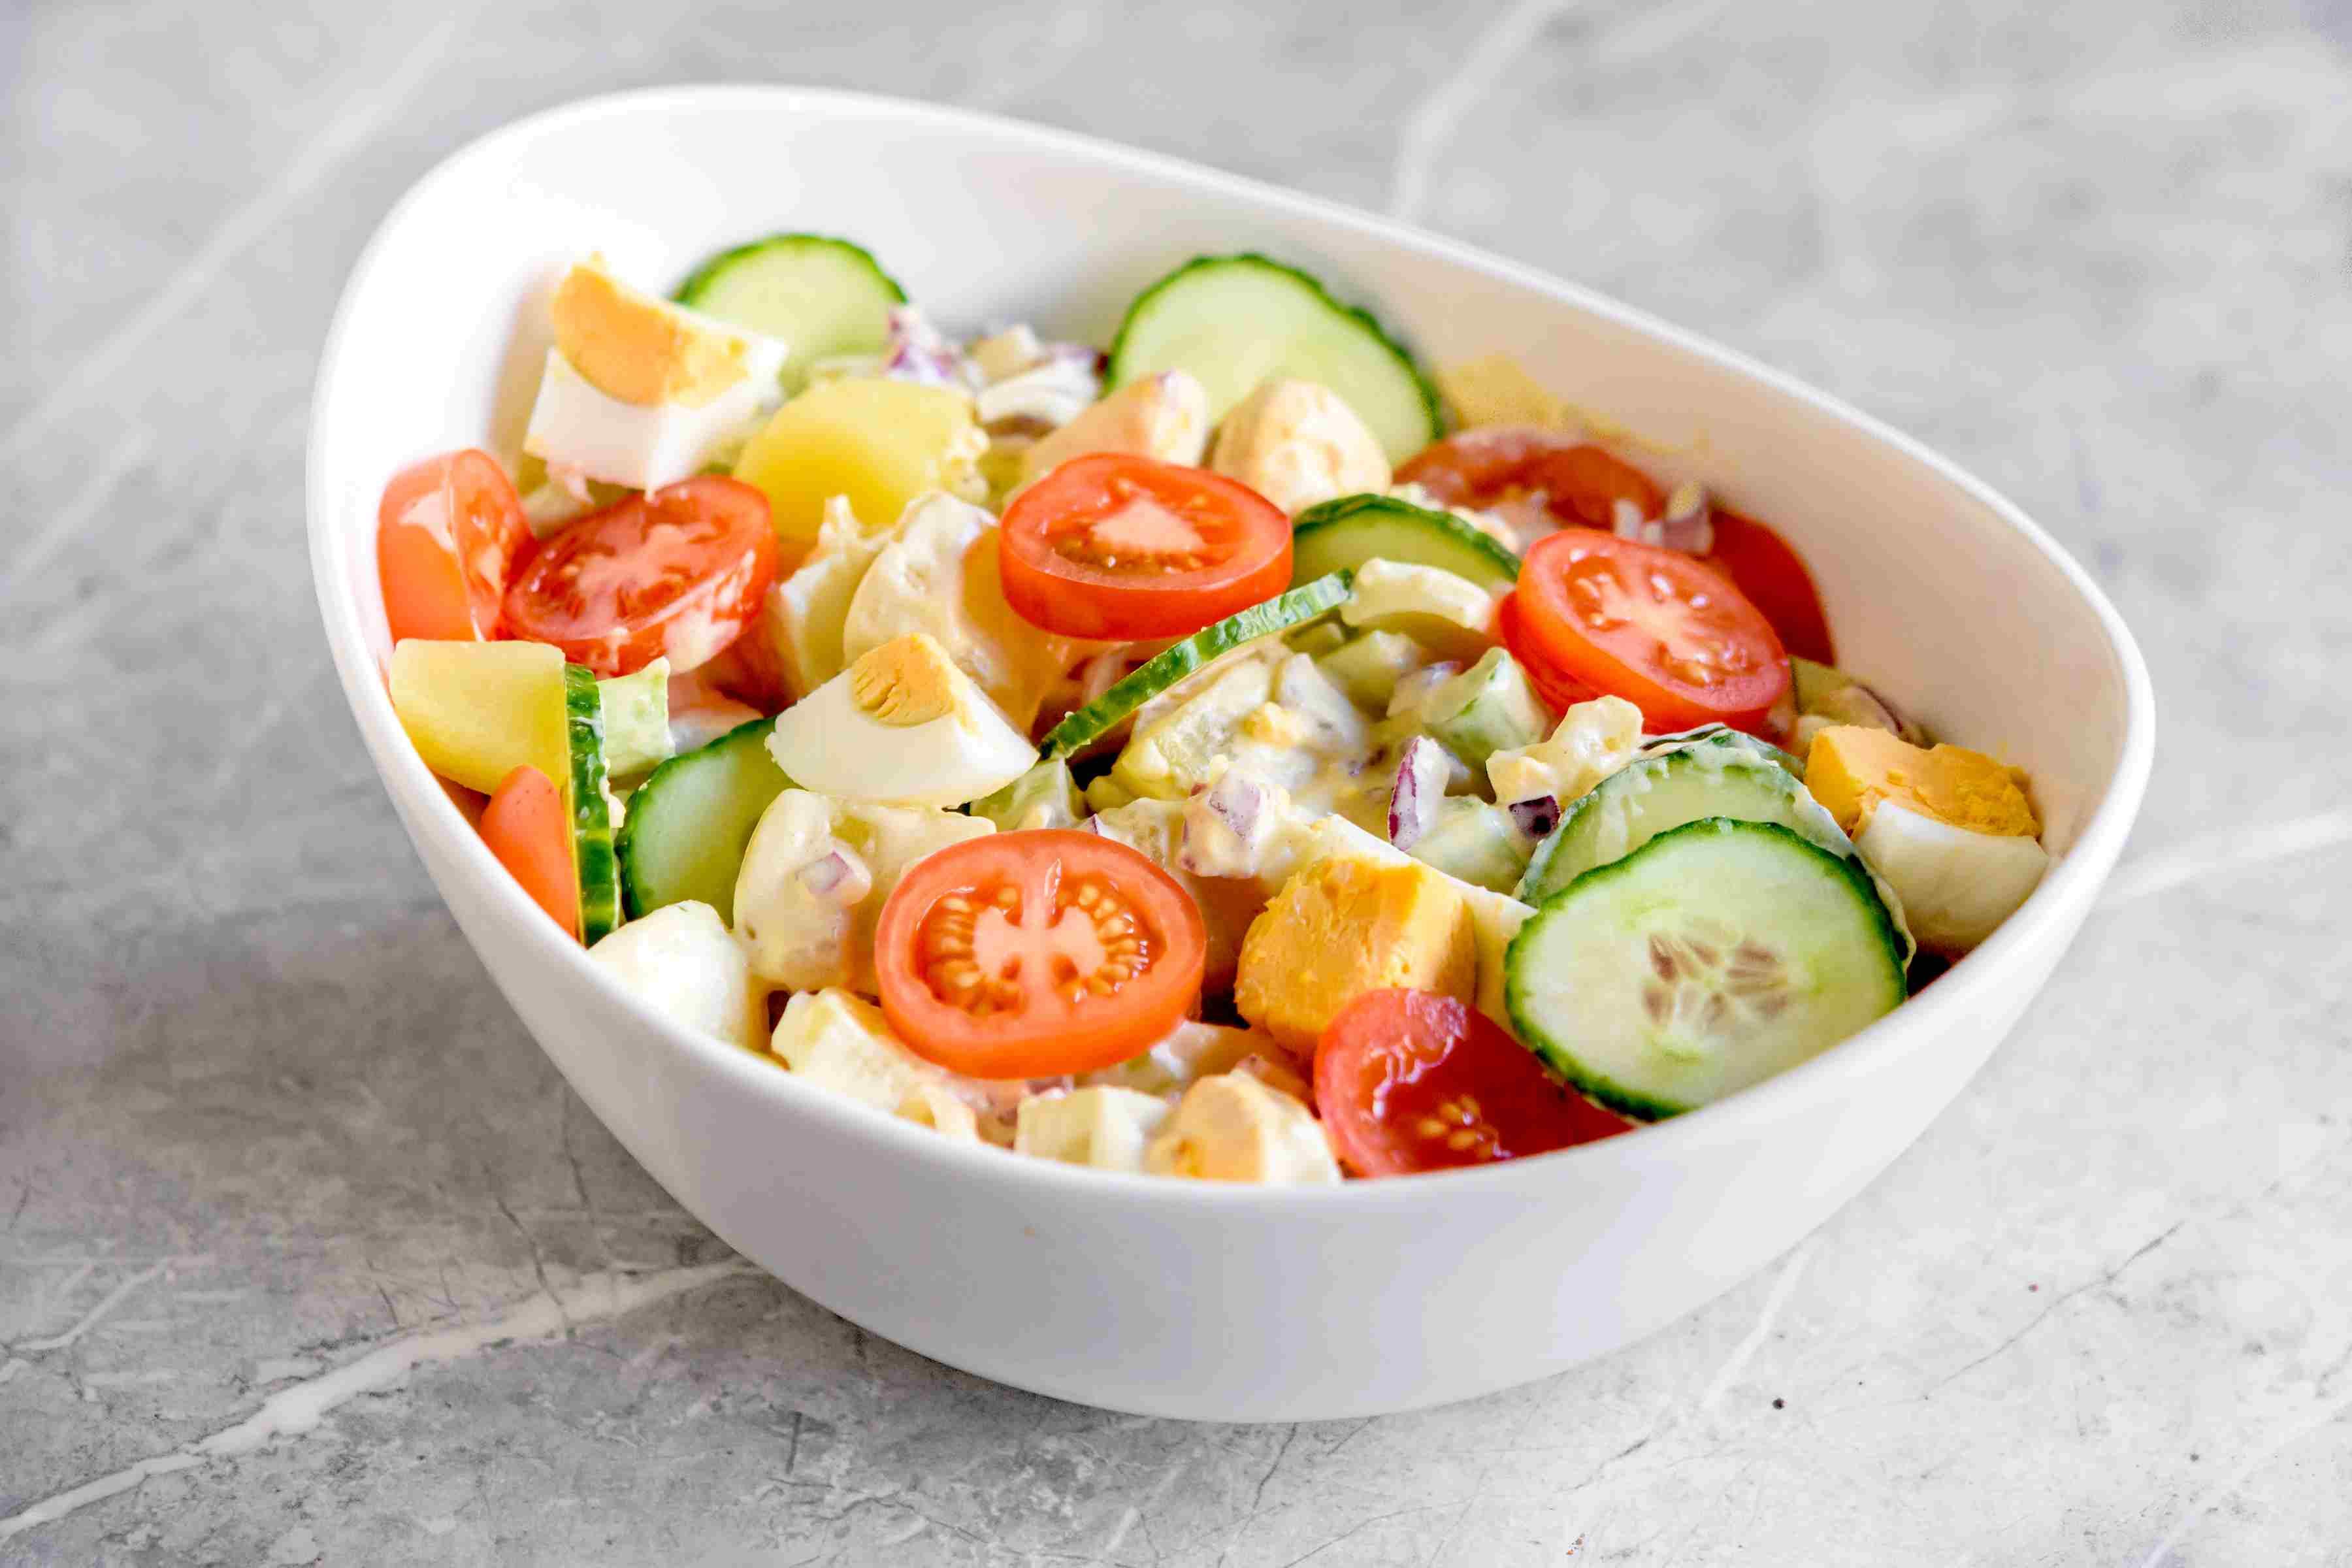 Potato salad with mayo and mustard